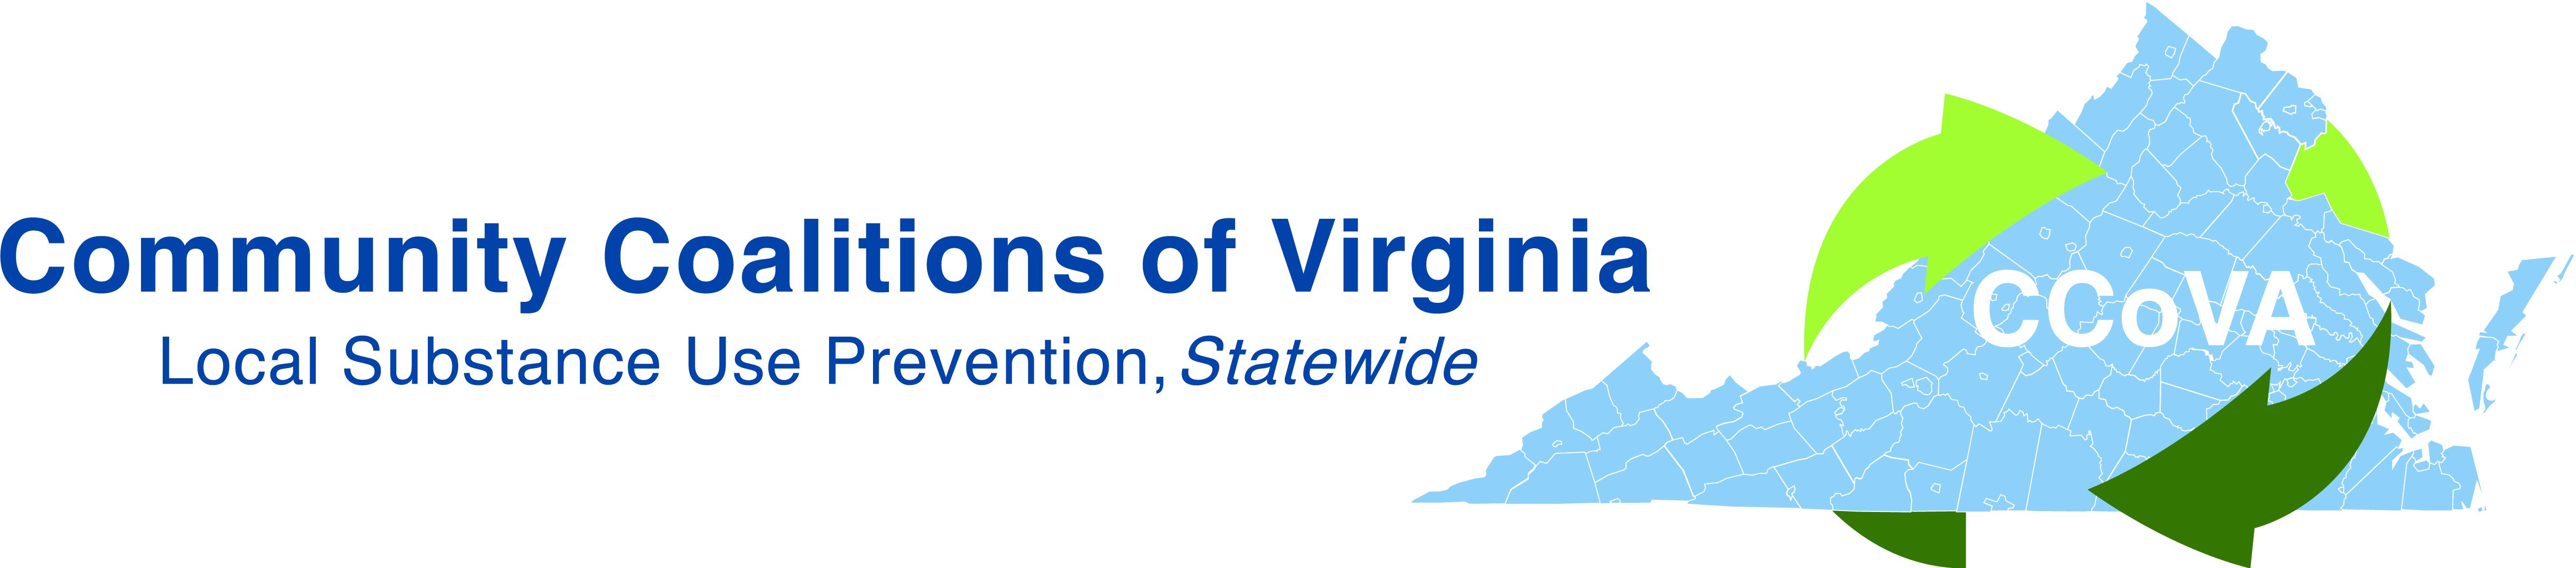 Community Coalitions of Virginia